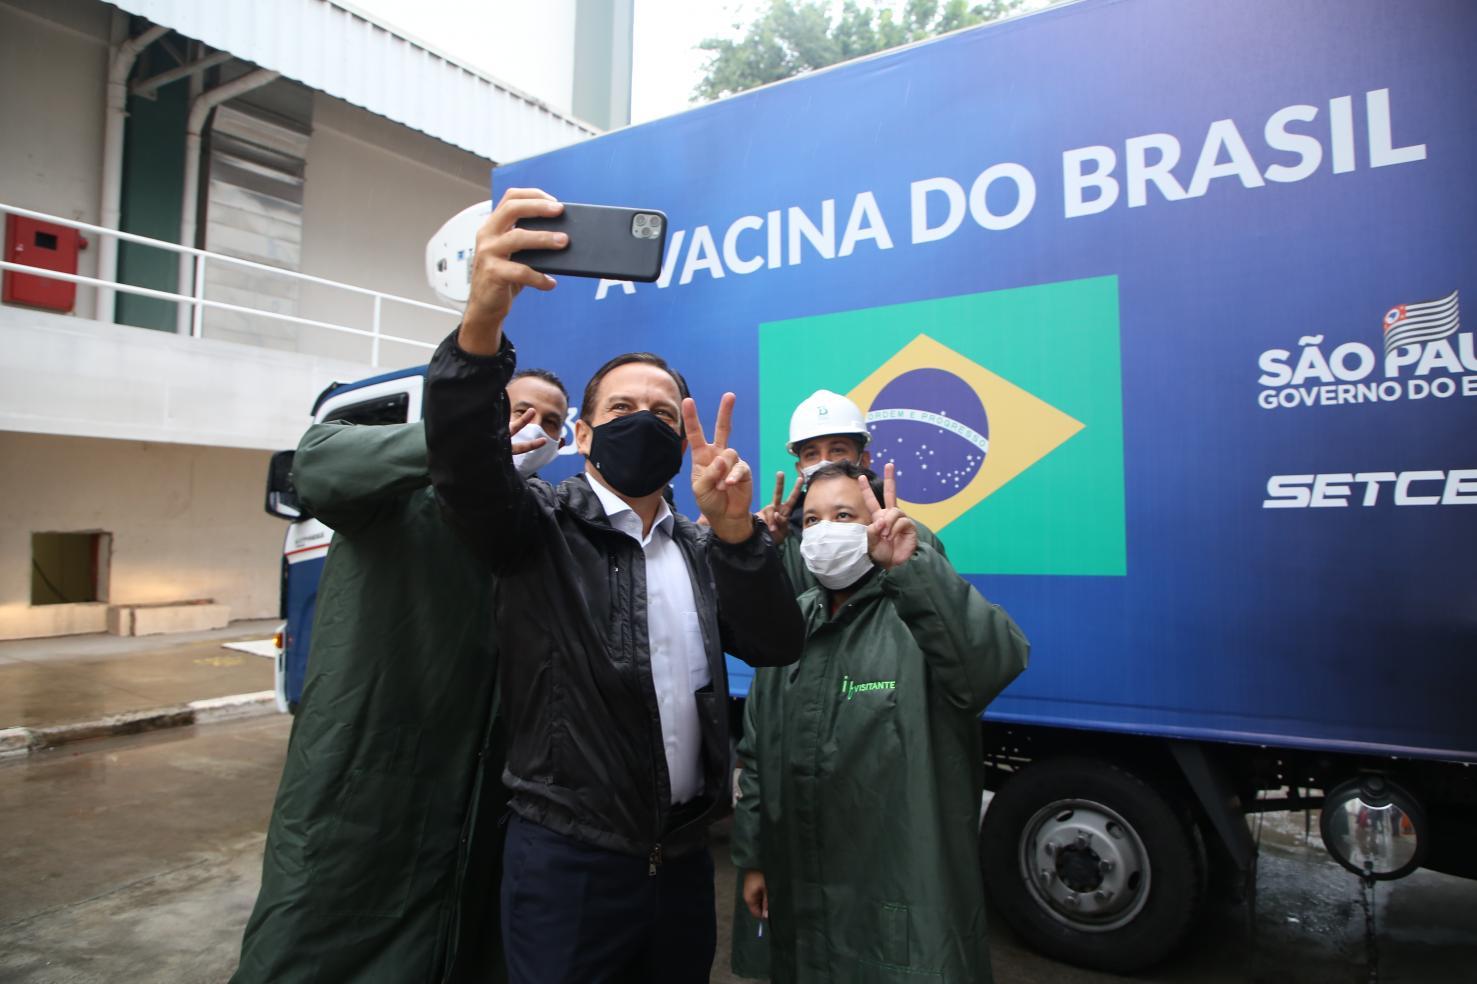 Governo de SP começa a distribuir segundo lote de vacinas do Butantan para o Brasil